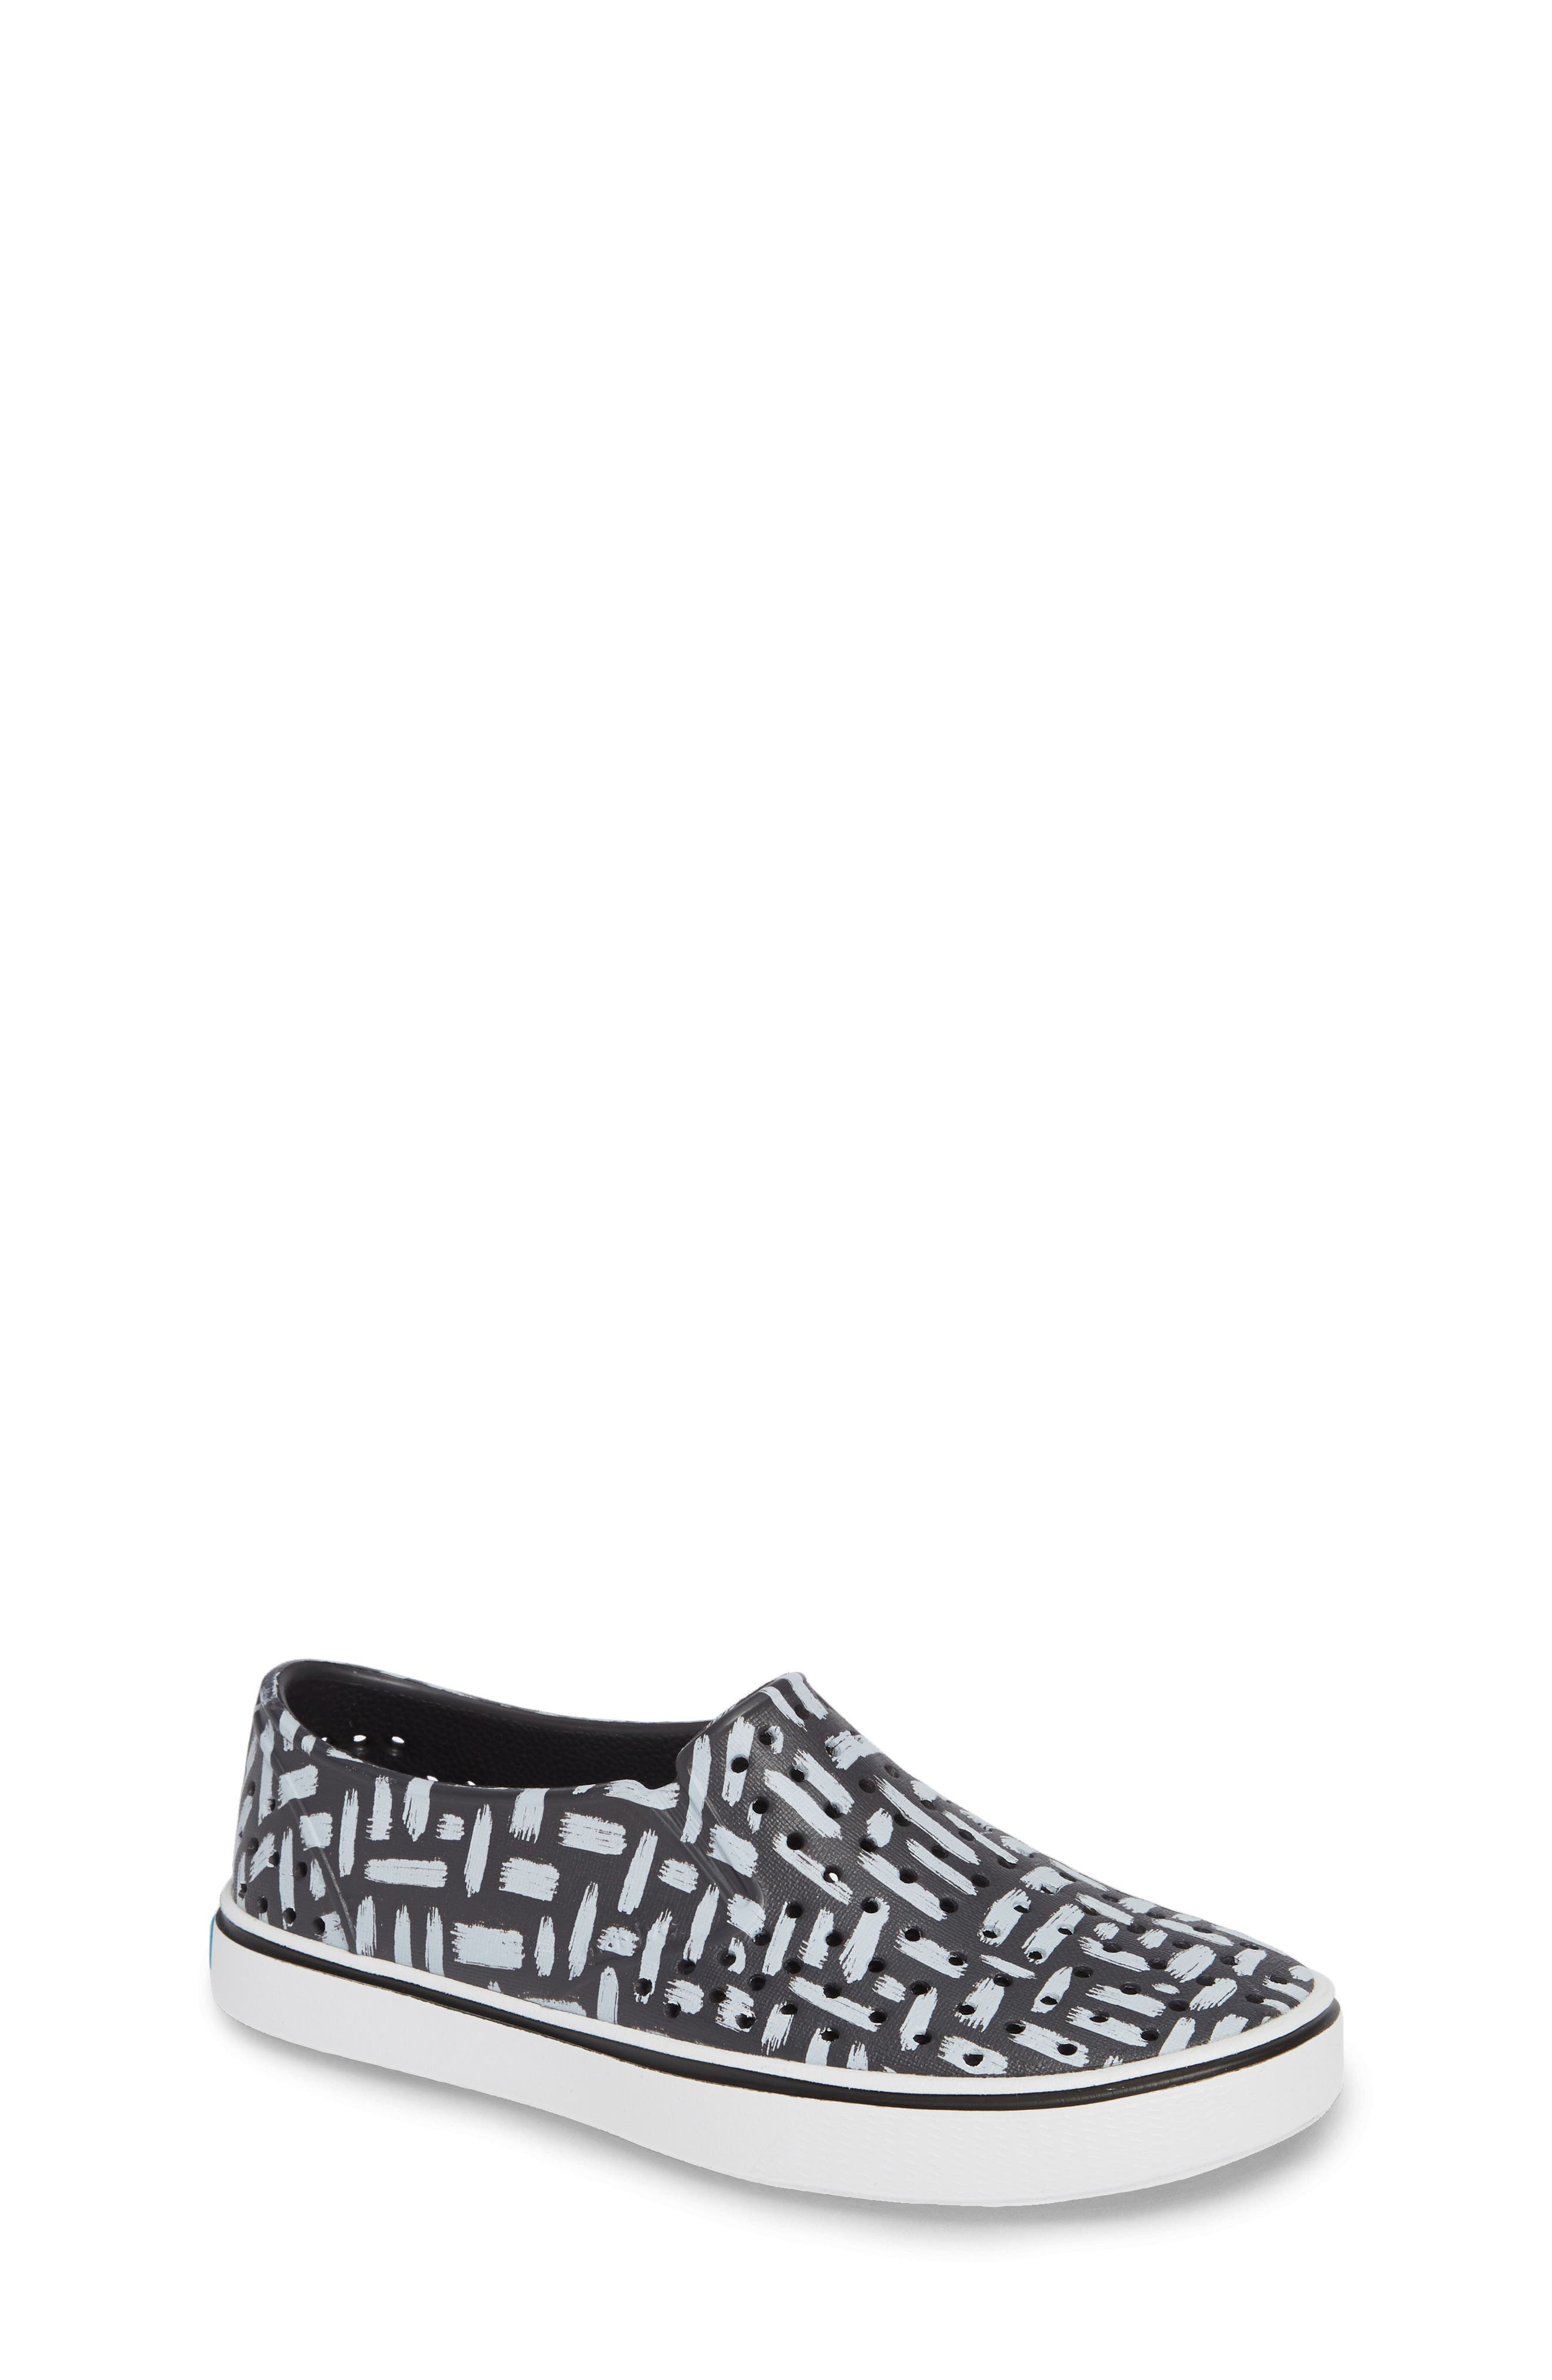 Miles Print Slip-On Sneaker,                             Main thumbnail 1, color,                             ONYX/ SHELL WHITE/ INKWELL